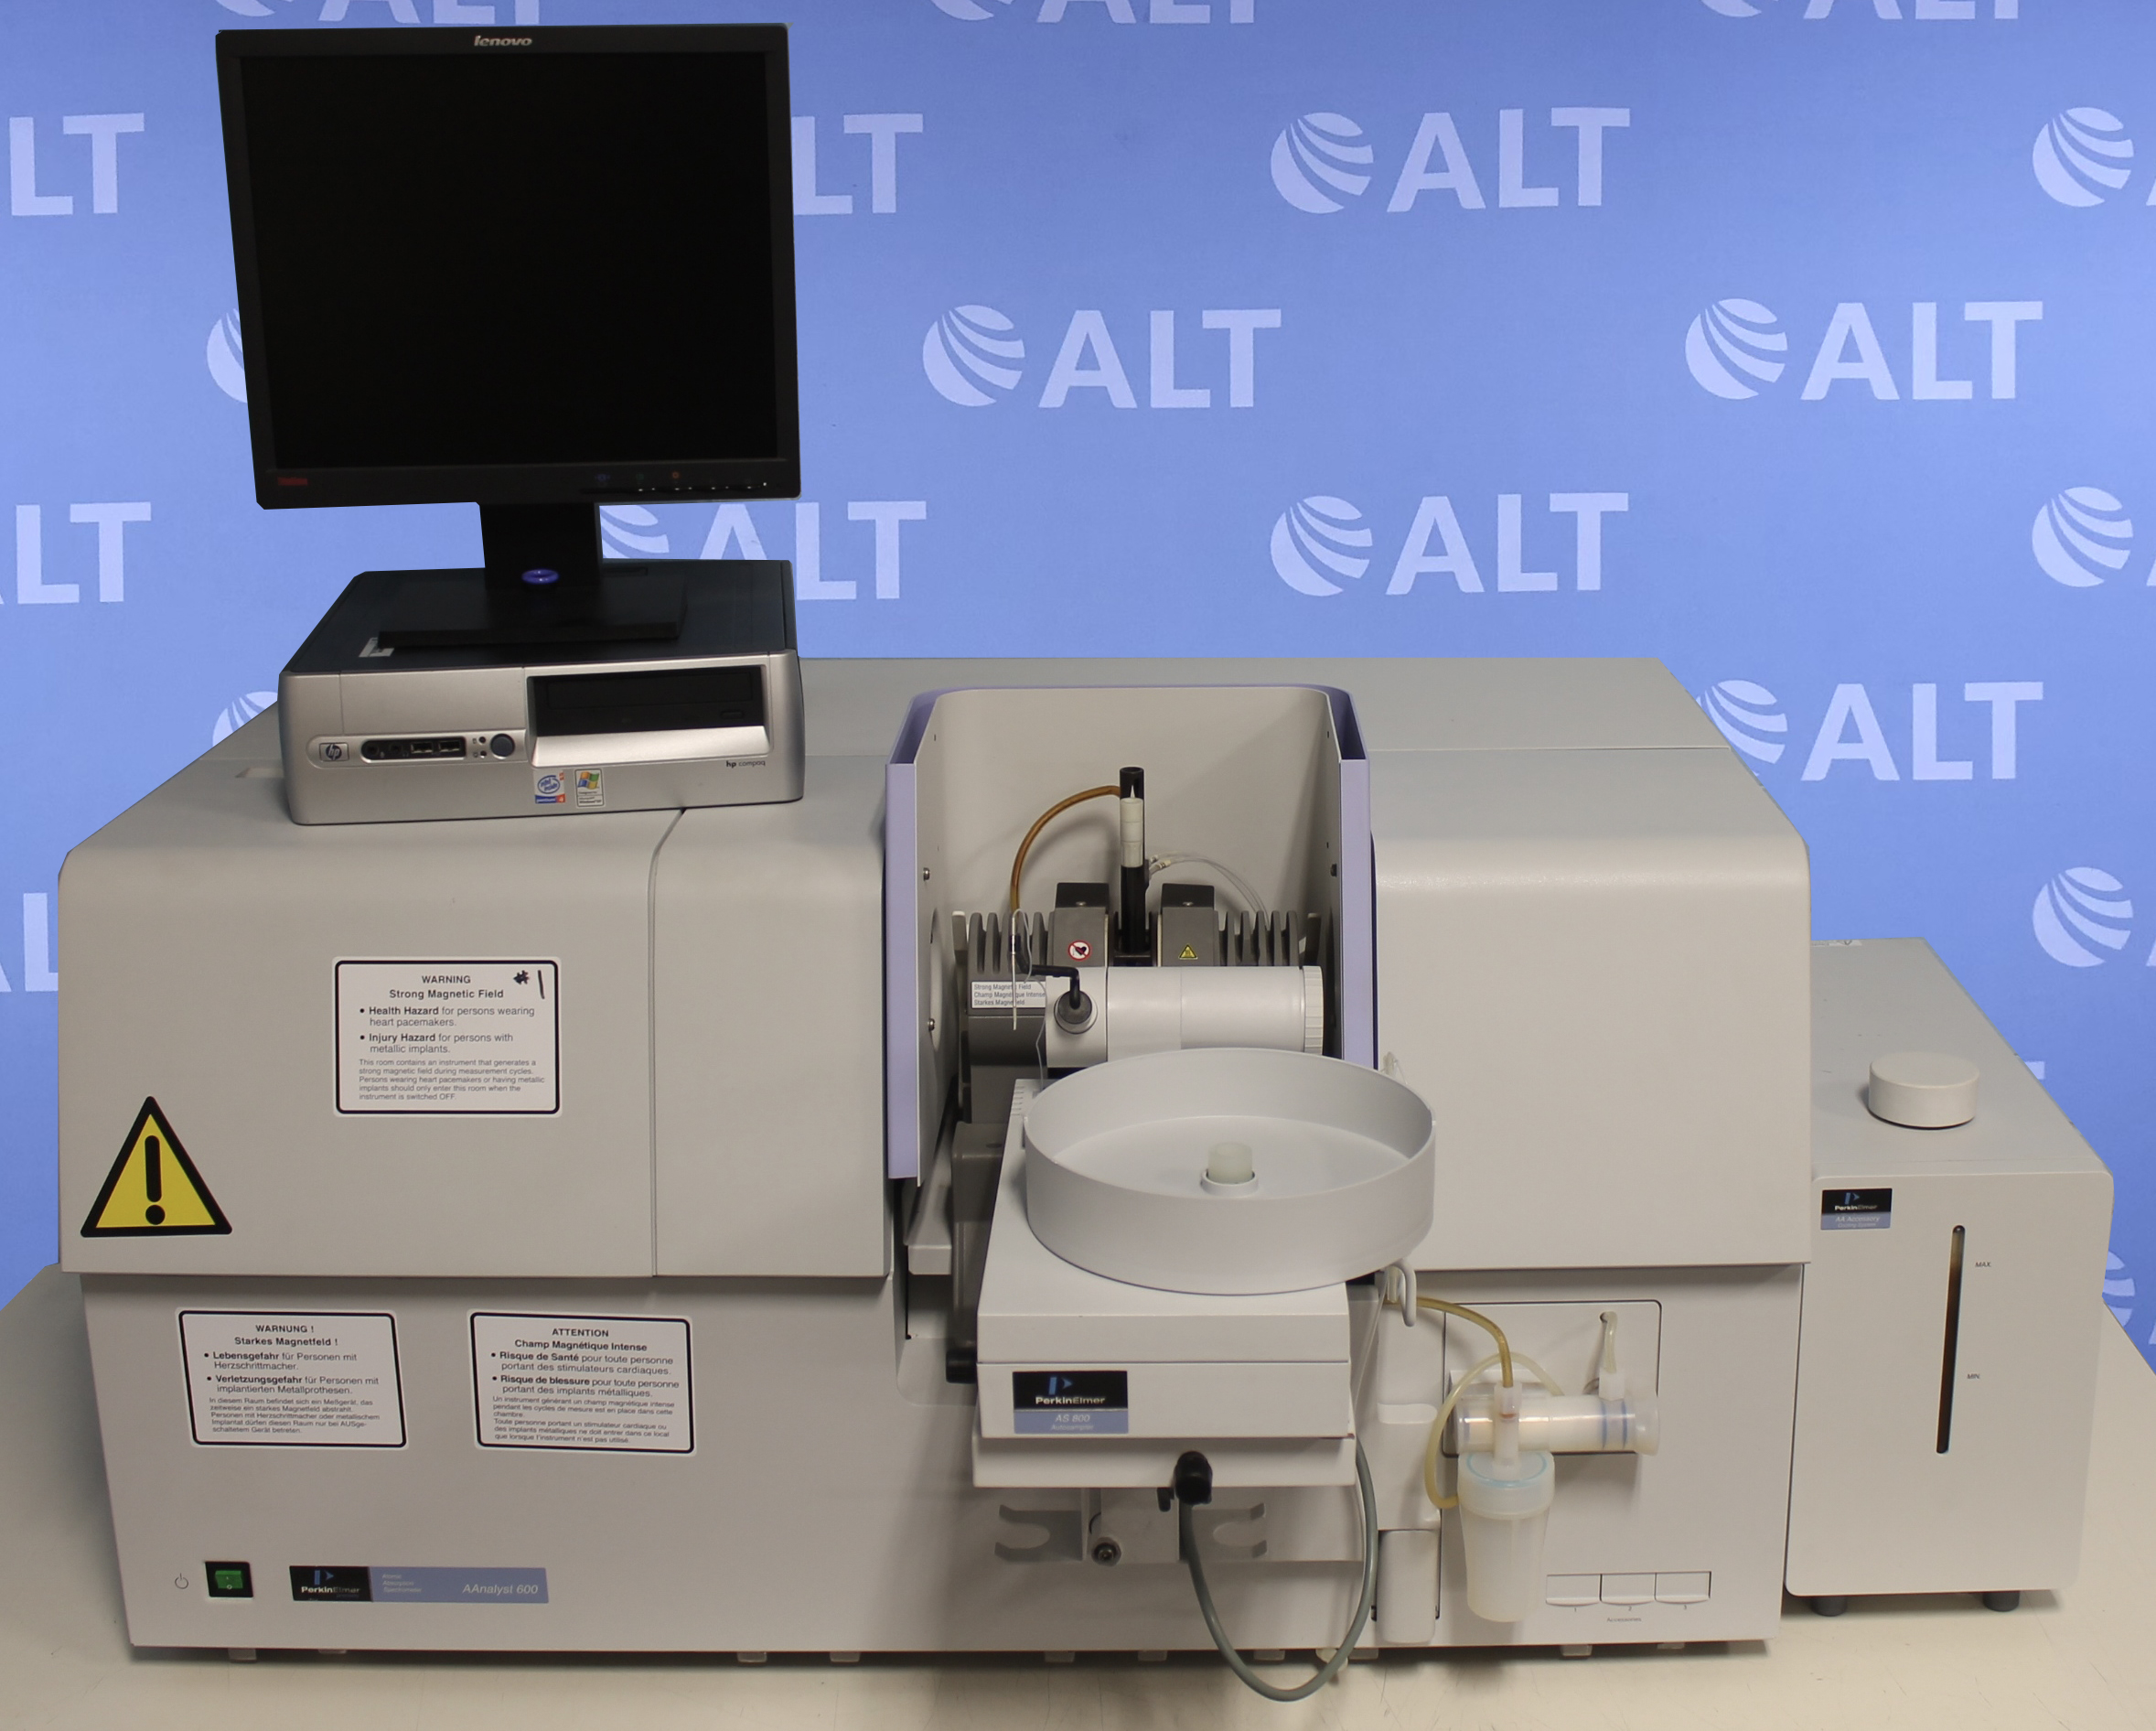 PerkinElmer AAnalyst 800 Atomic Absorption Spectrometer Image